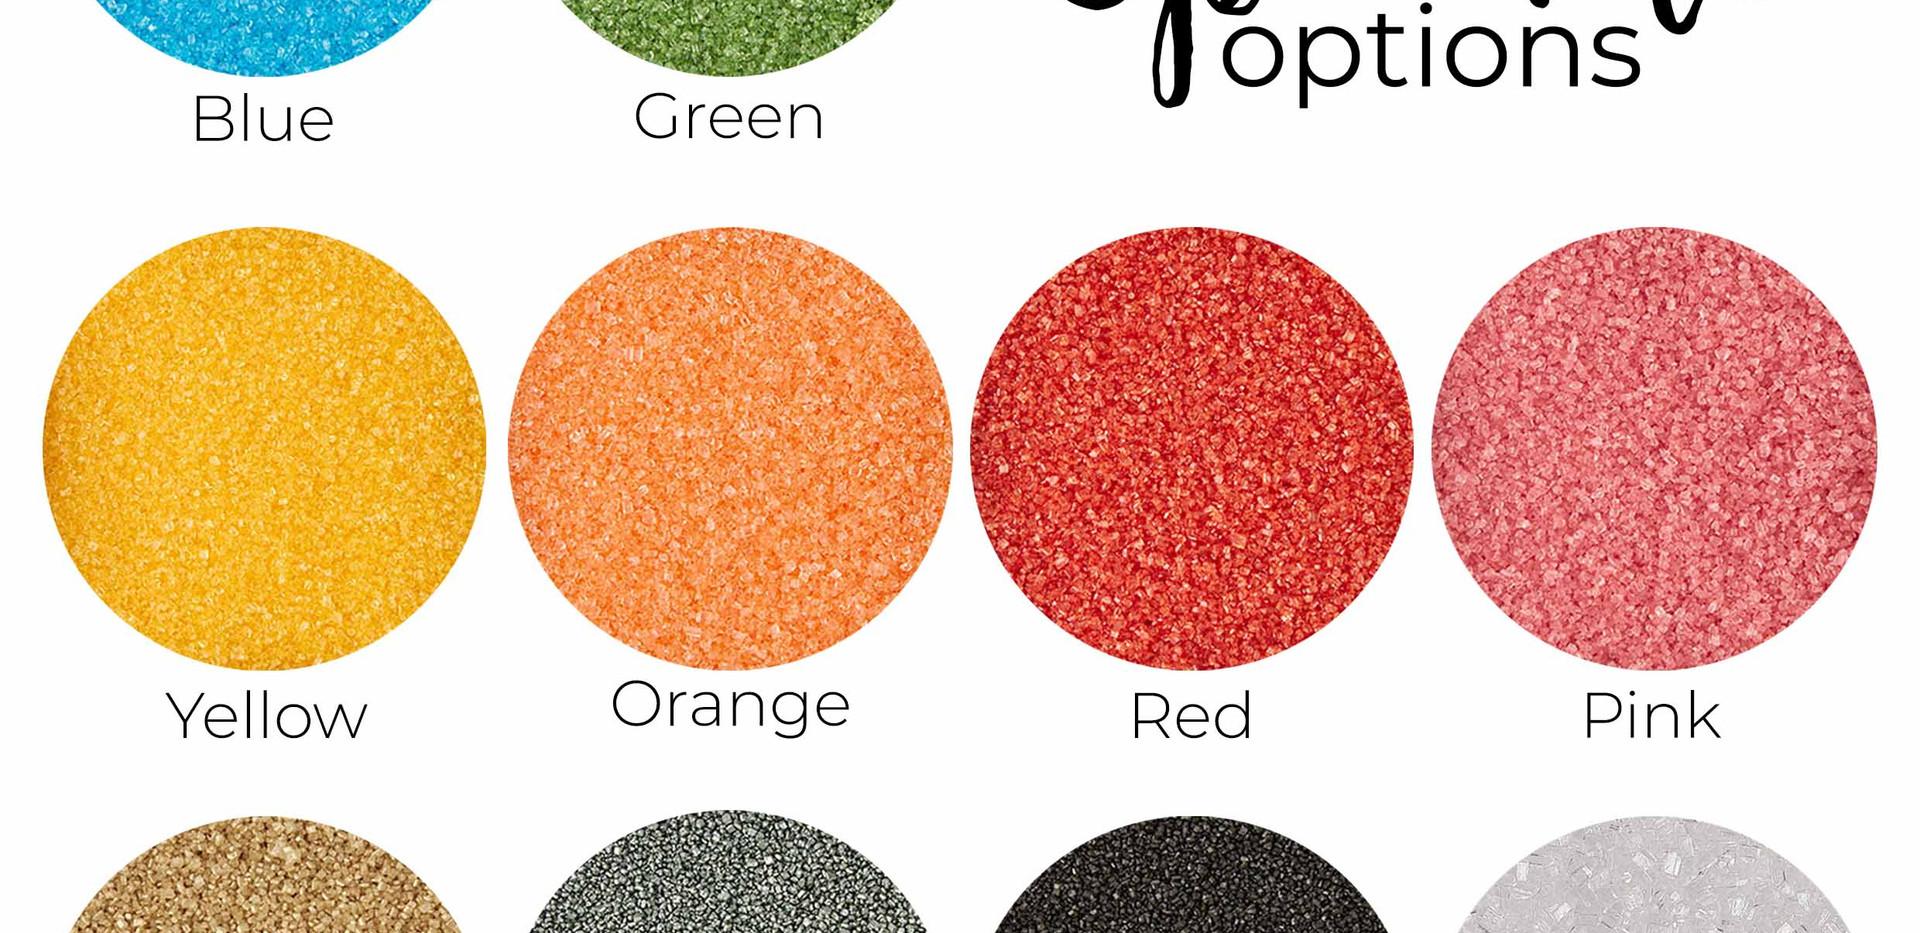 Sprinke Colour chart LR.jpg